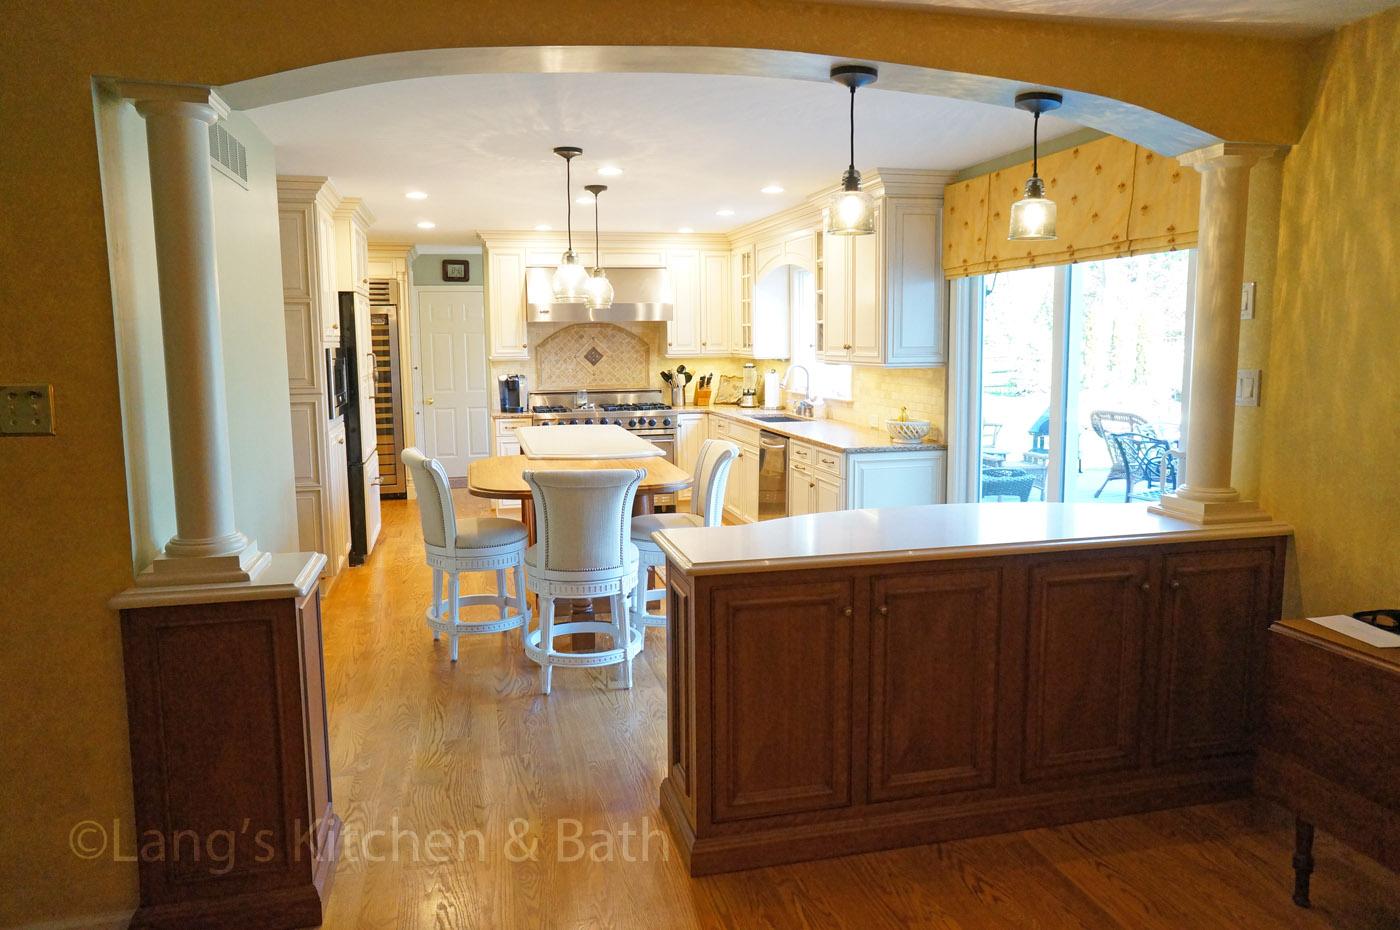 Kitchen design with large, sliding glass doors